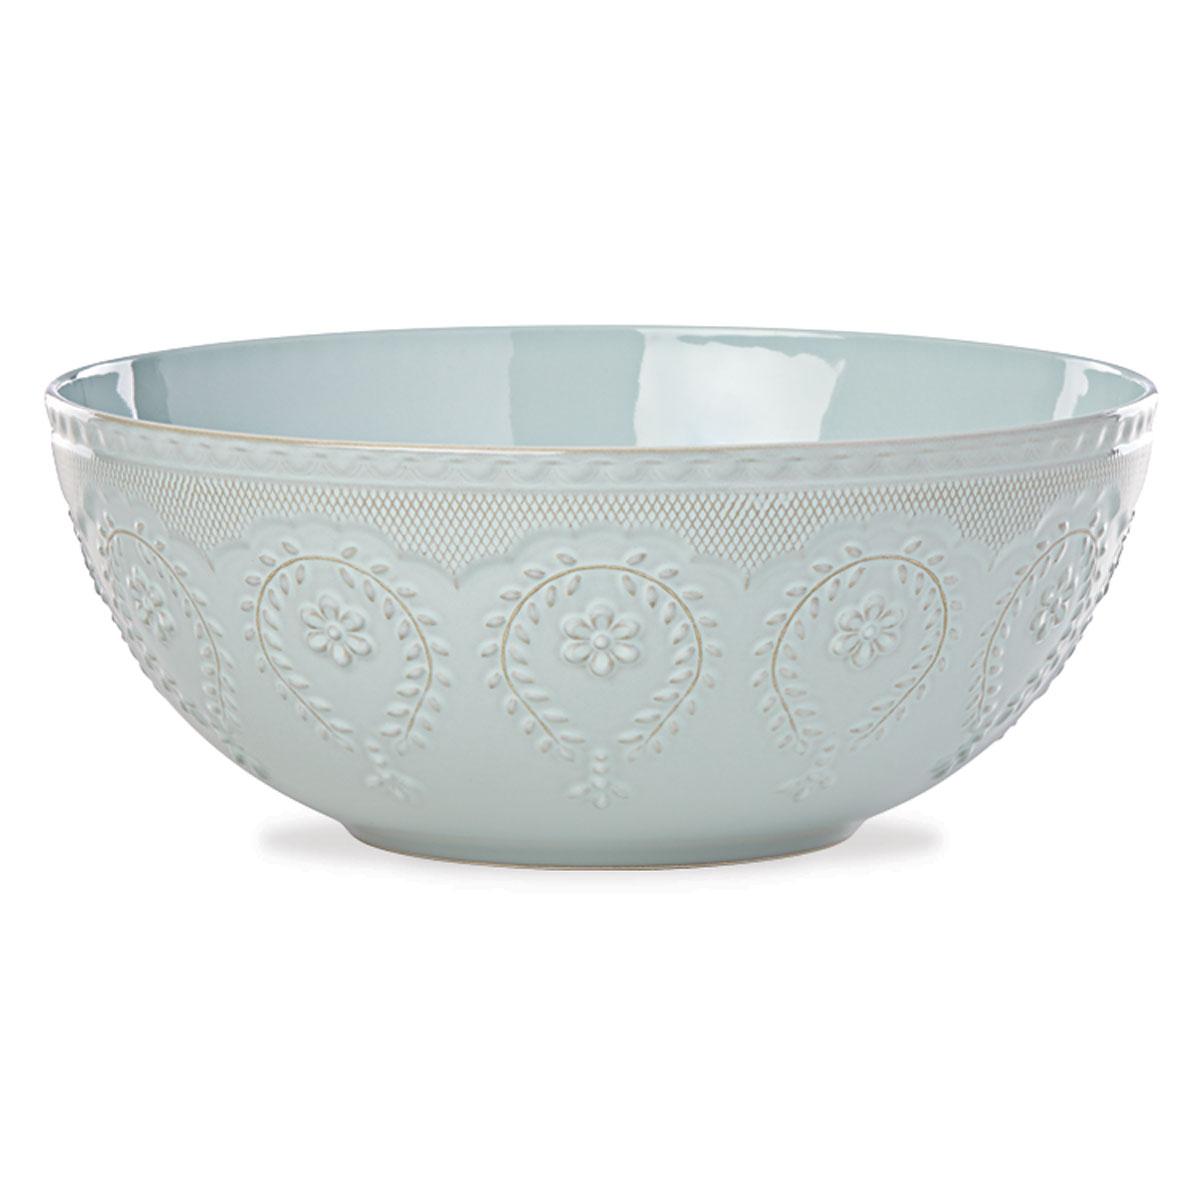 Lenox Chelse Muse Dinnerware Rct Blue Serving Bowl